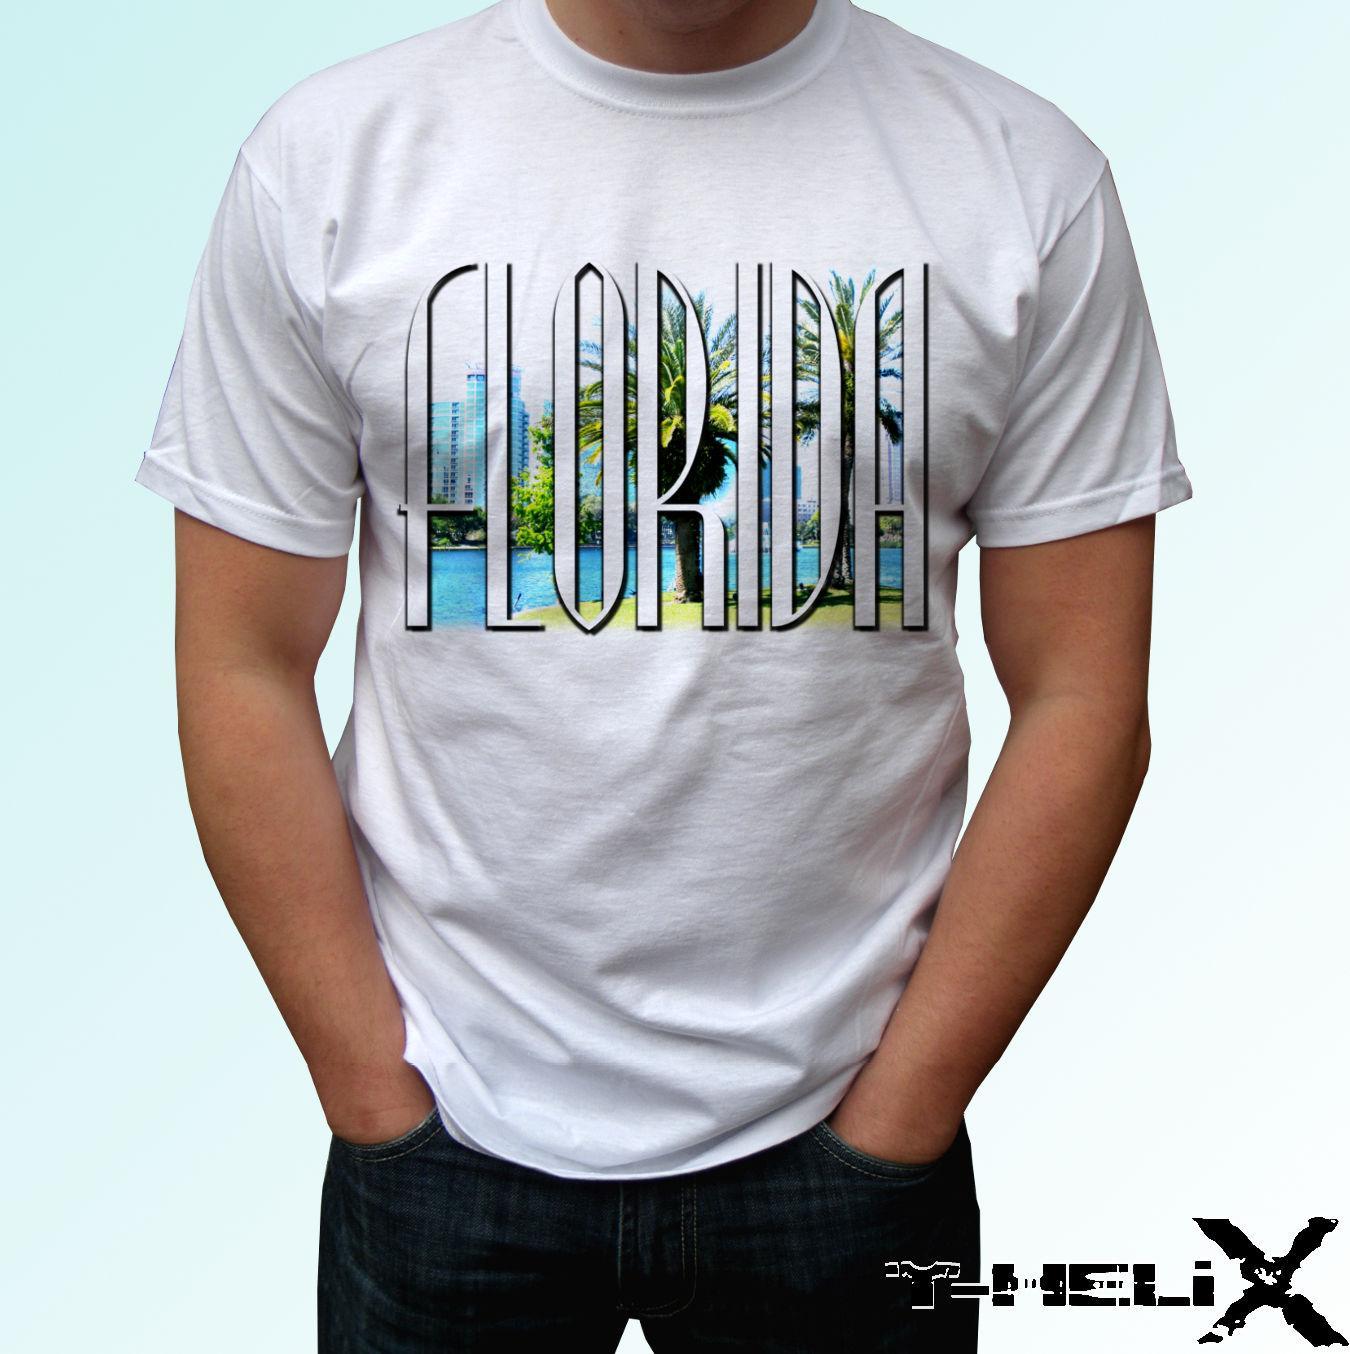 Florida White T Shirt Top Holiday Design Mens Womens Kids Baby